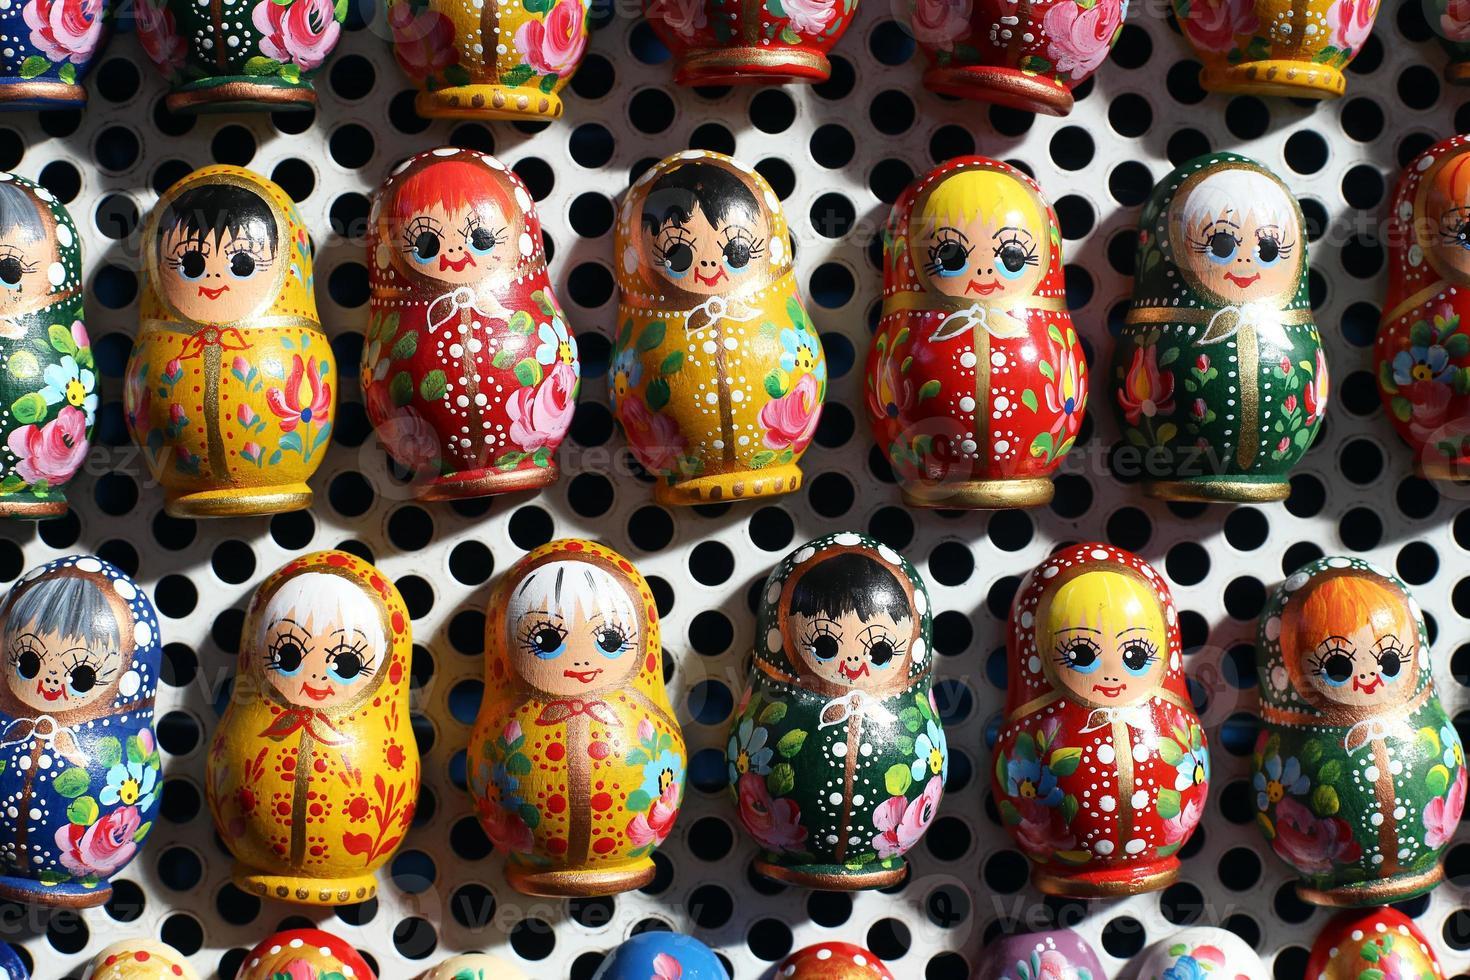 Grupo de muñecas rusas matreshka como recuerdos foto